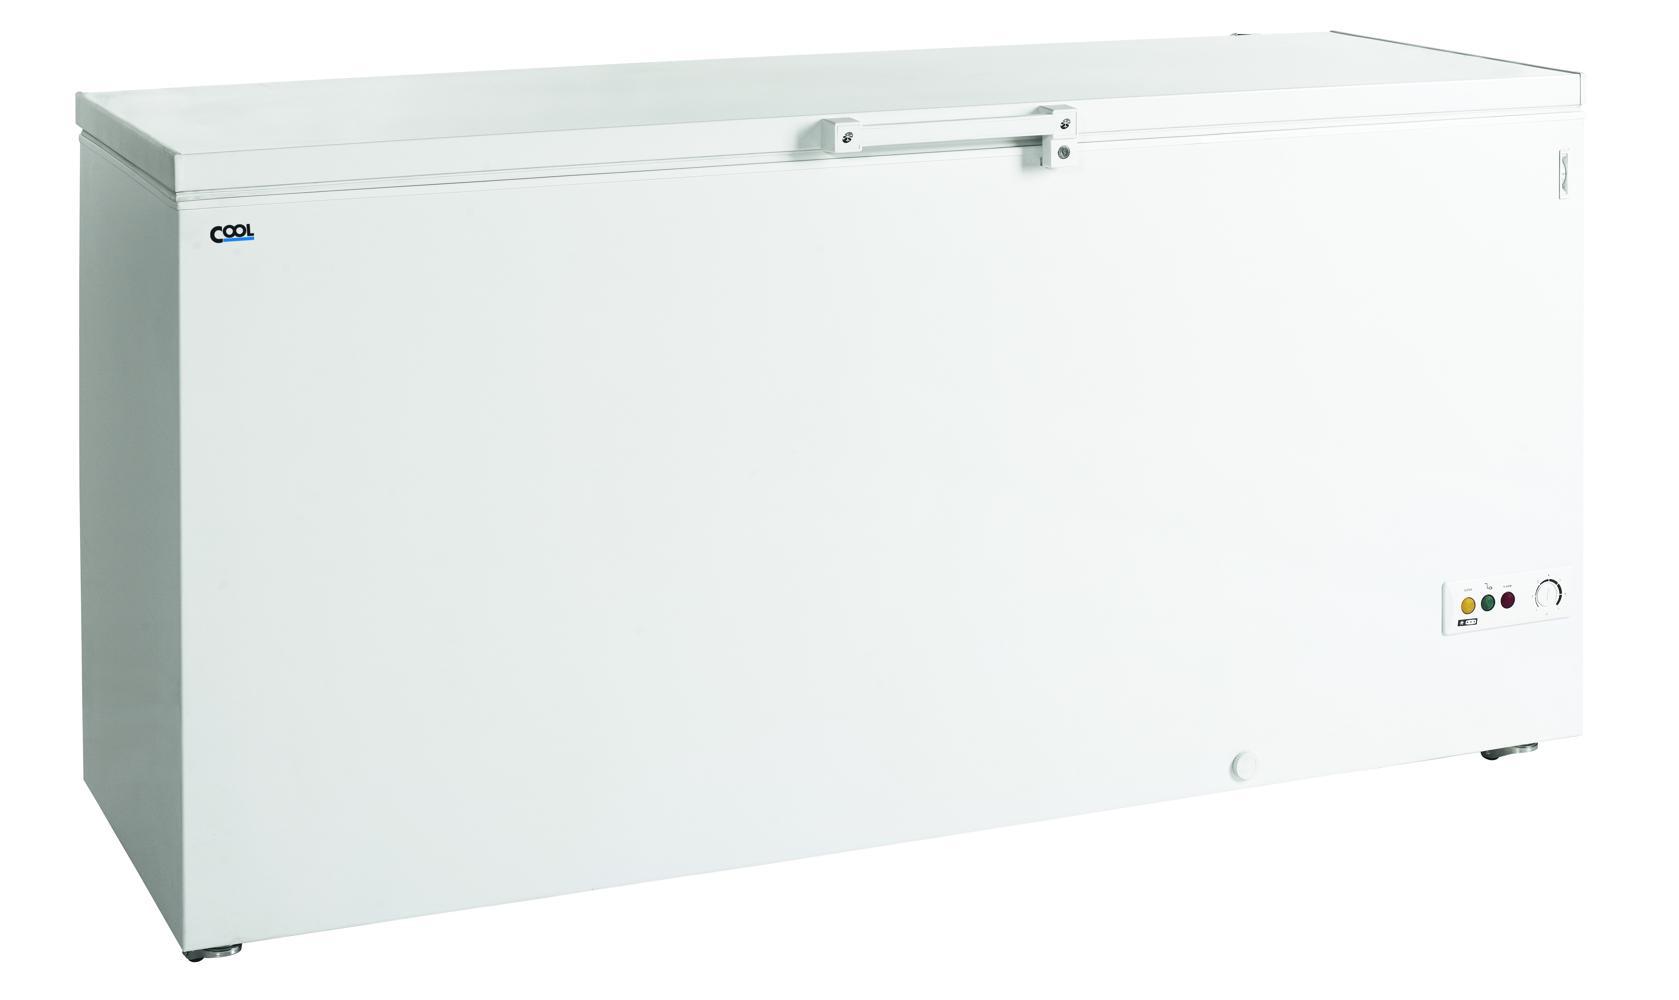 COOL LINE Tiefkühltruhe TKT 605